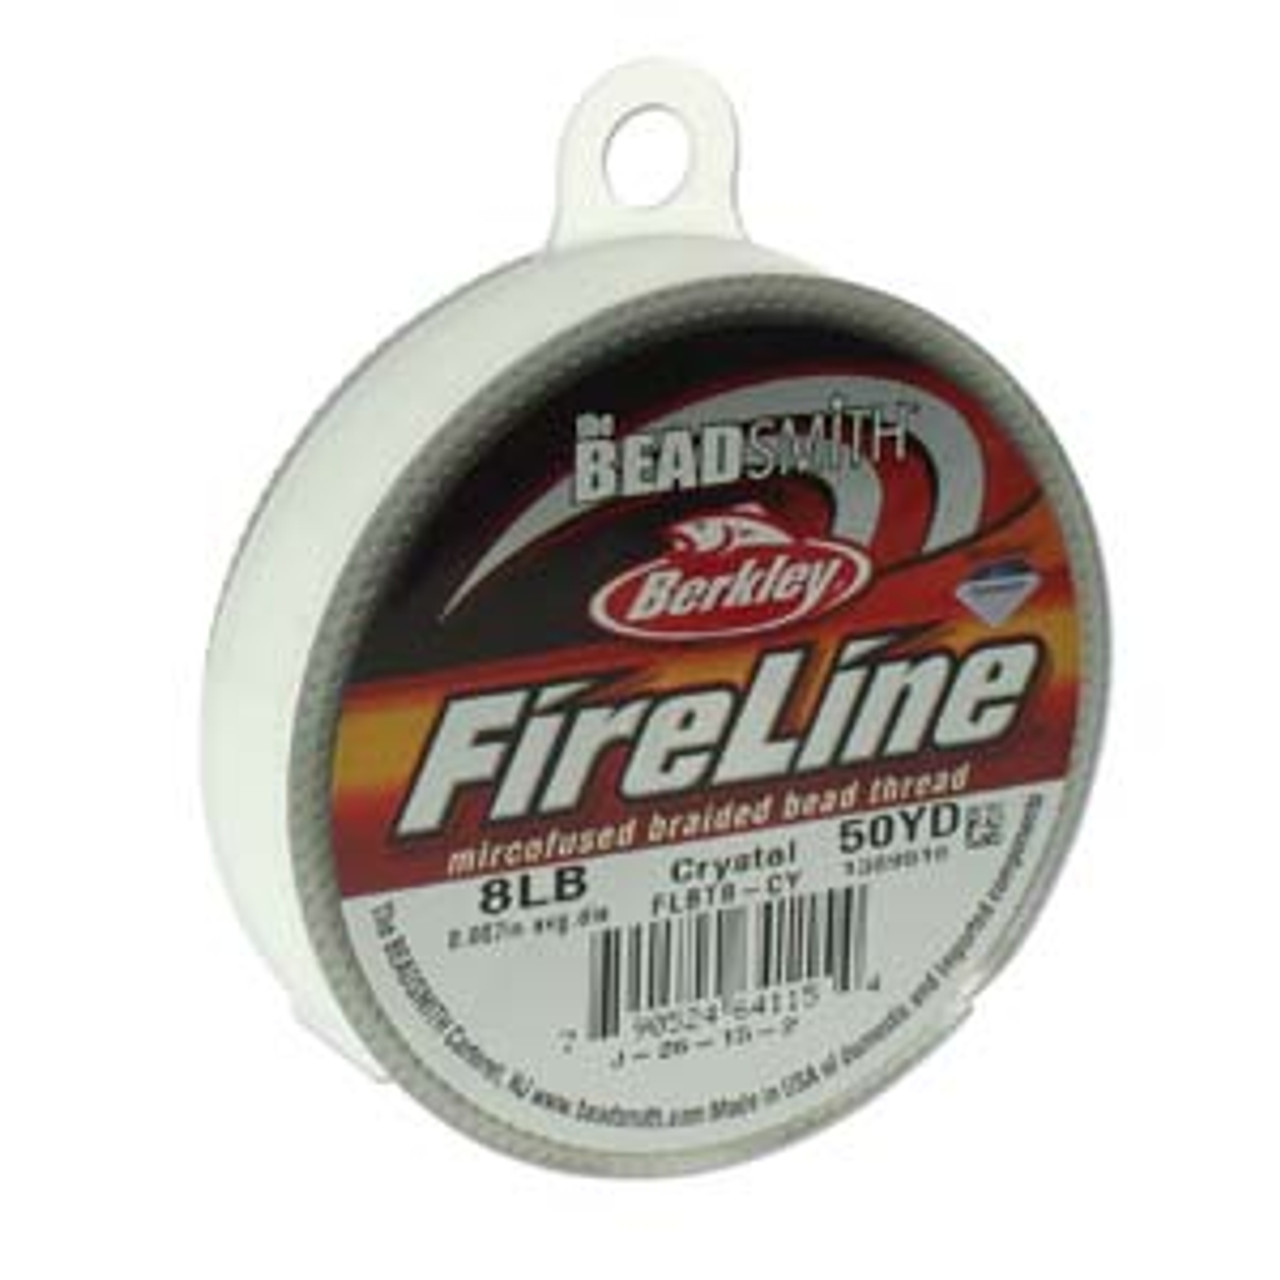 8lb Crystal Fireline - 50yds